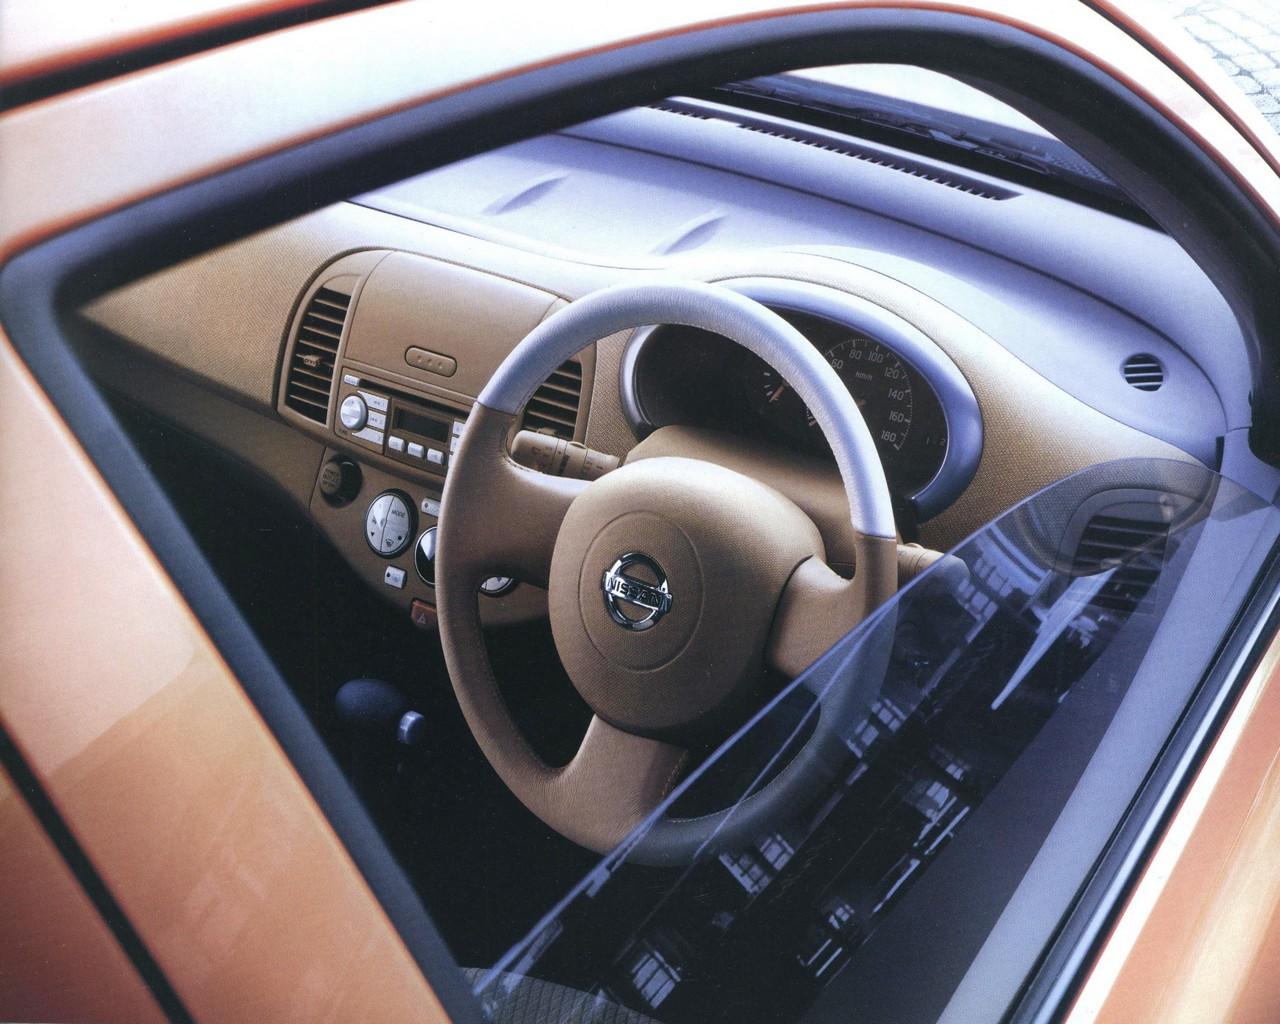 Image Result For Automotive Dash Cam Review